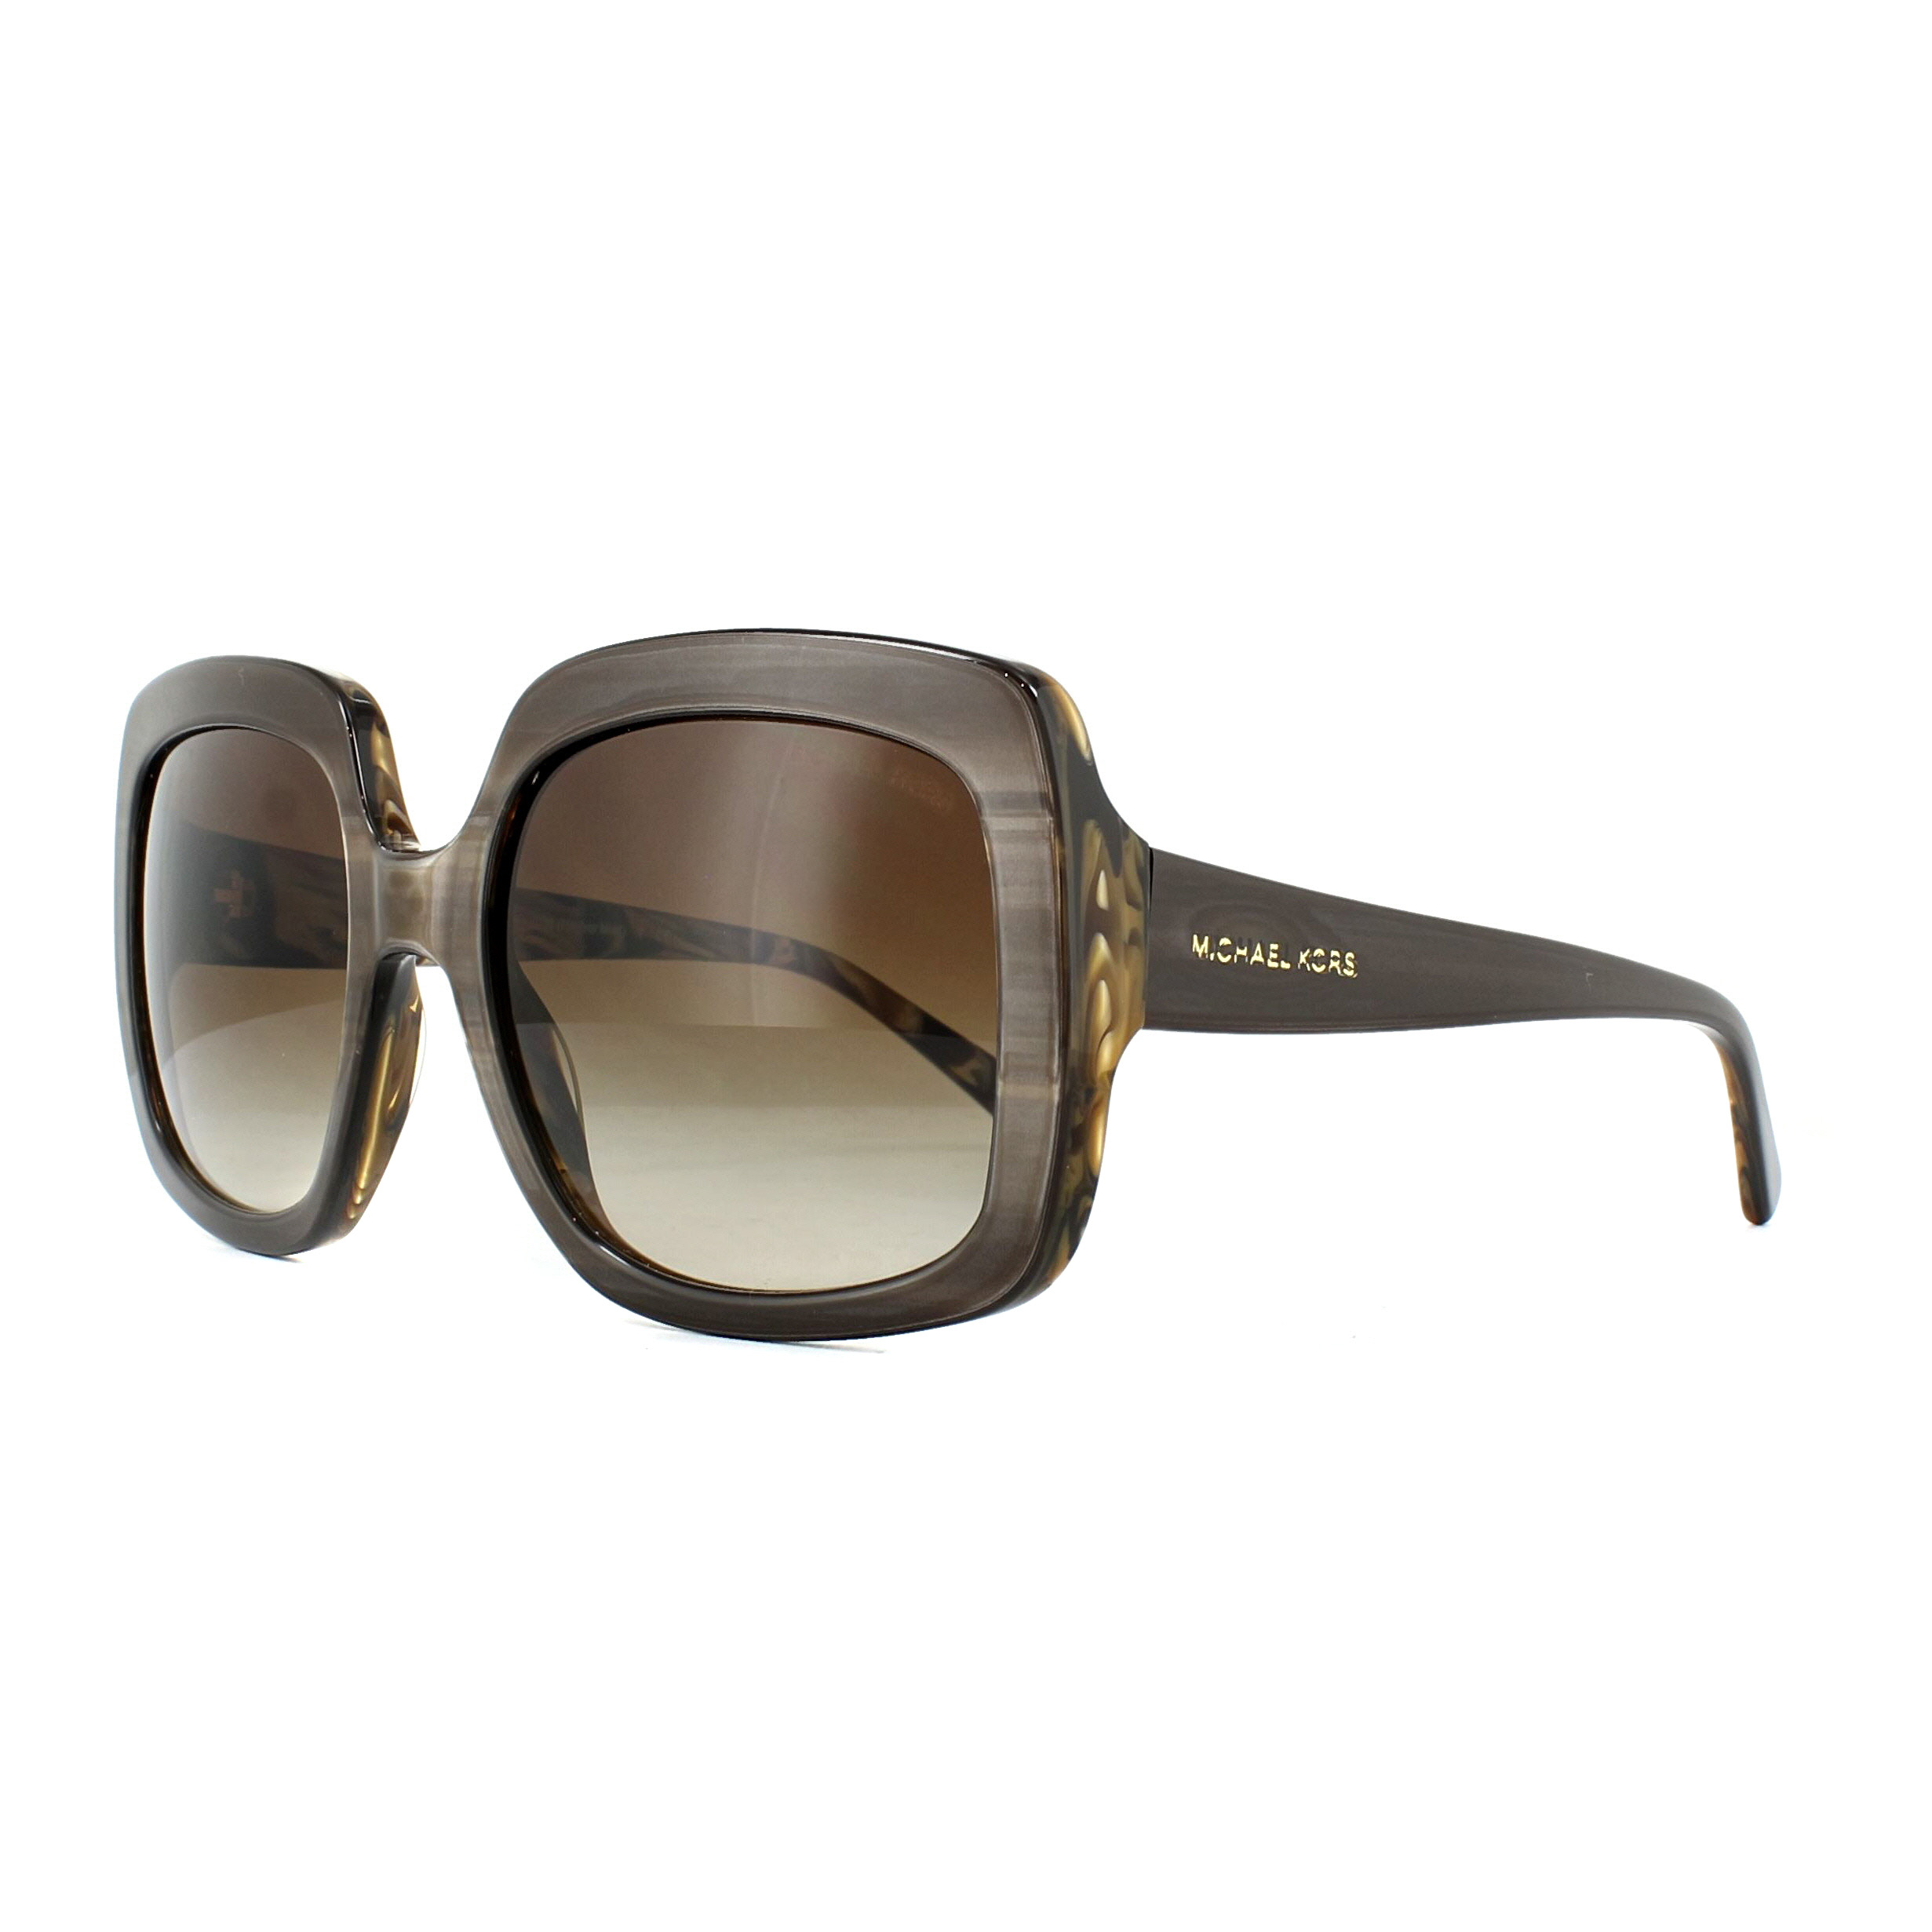 22a1ae1a02 Sentinel Michael Kors Sunglasses Harbor Mist 2036 321213 Bronze Horn Smoke  Gradient